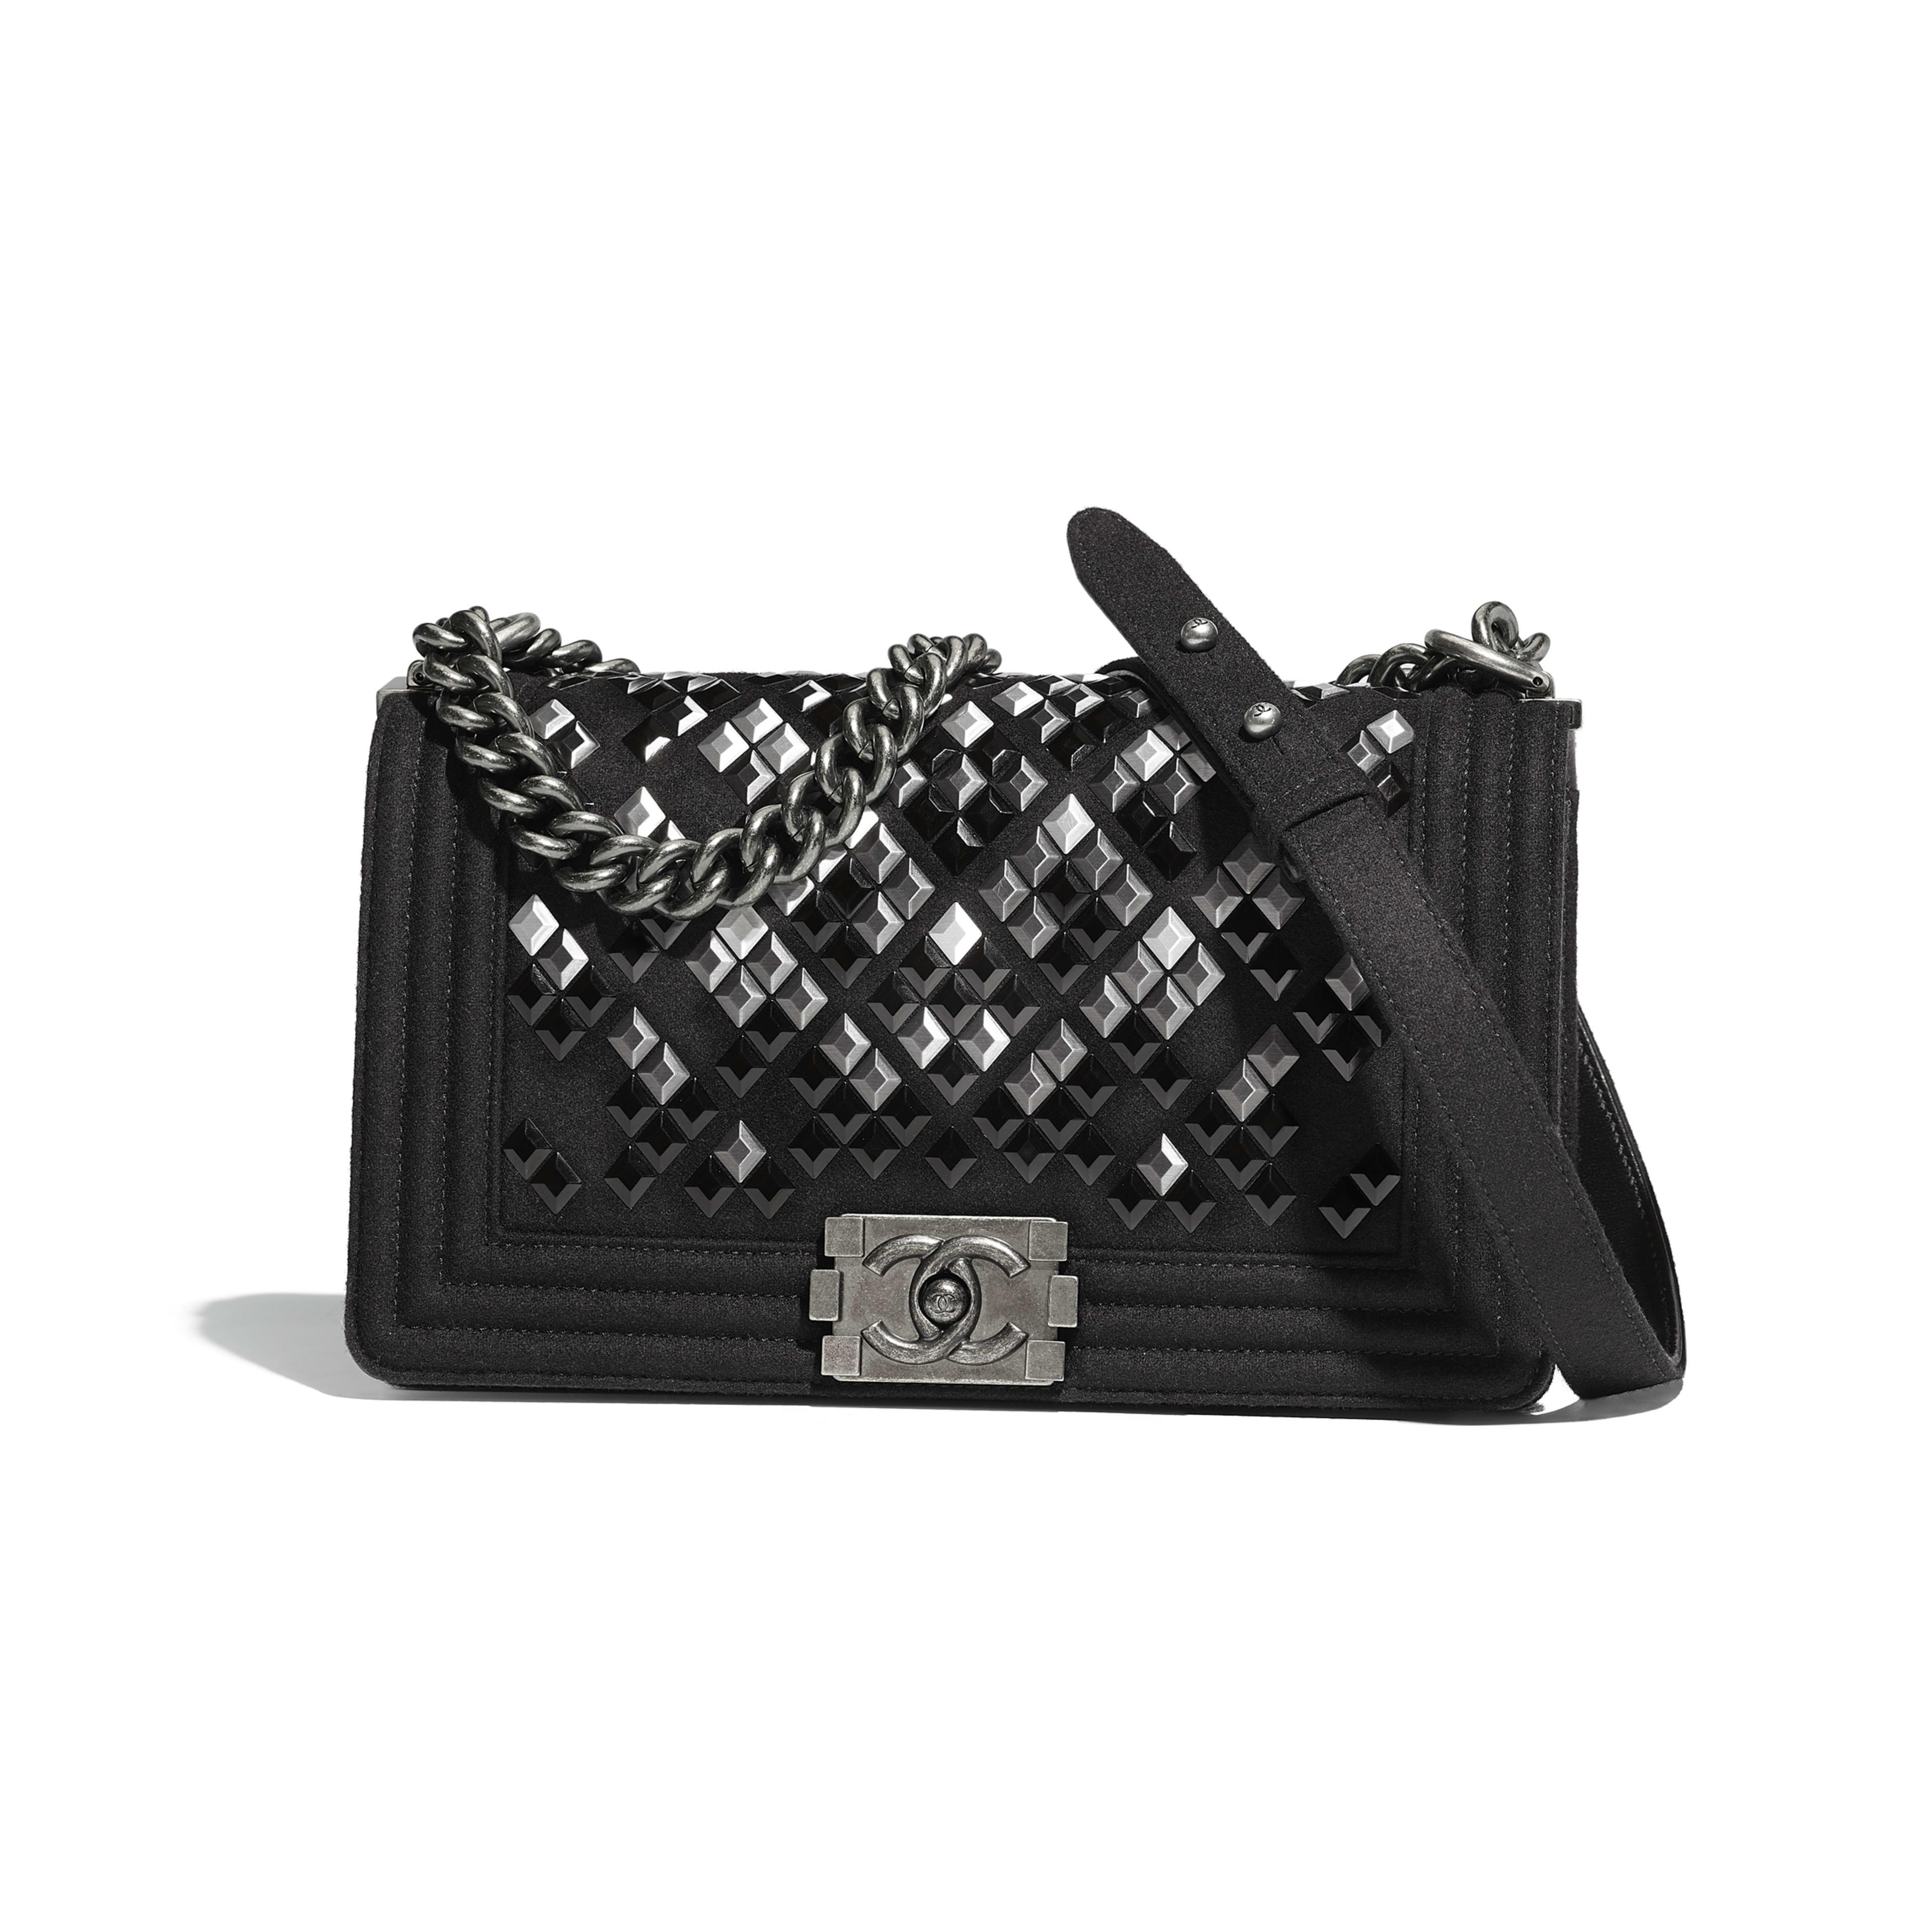 BOY CHANEL Handbag Embroidered Wool, Lambskin & Ruthenium-Finish Metal Black -                                  view 1 - see full sized version